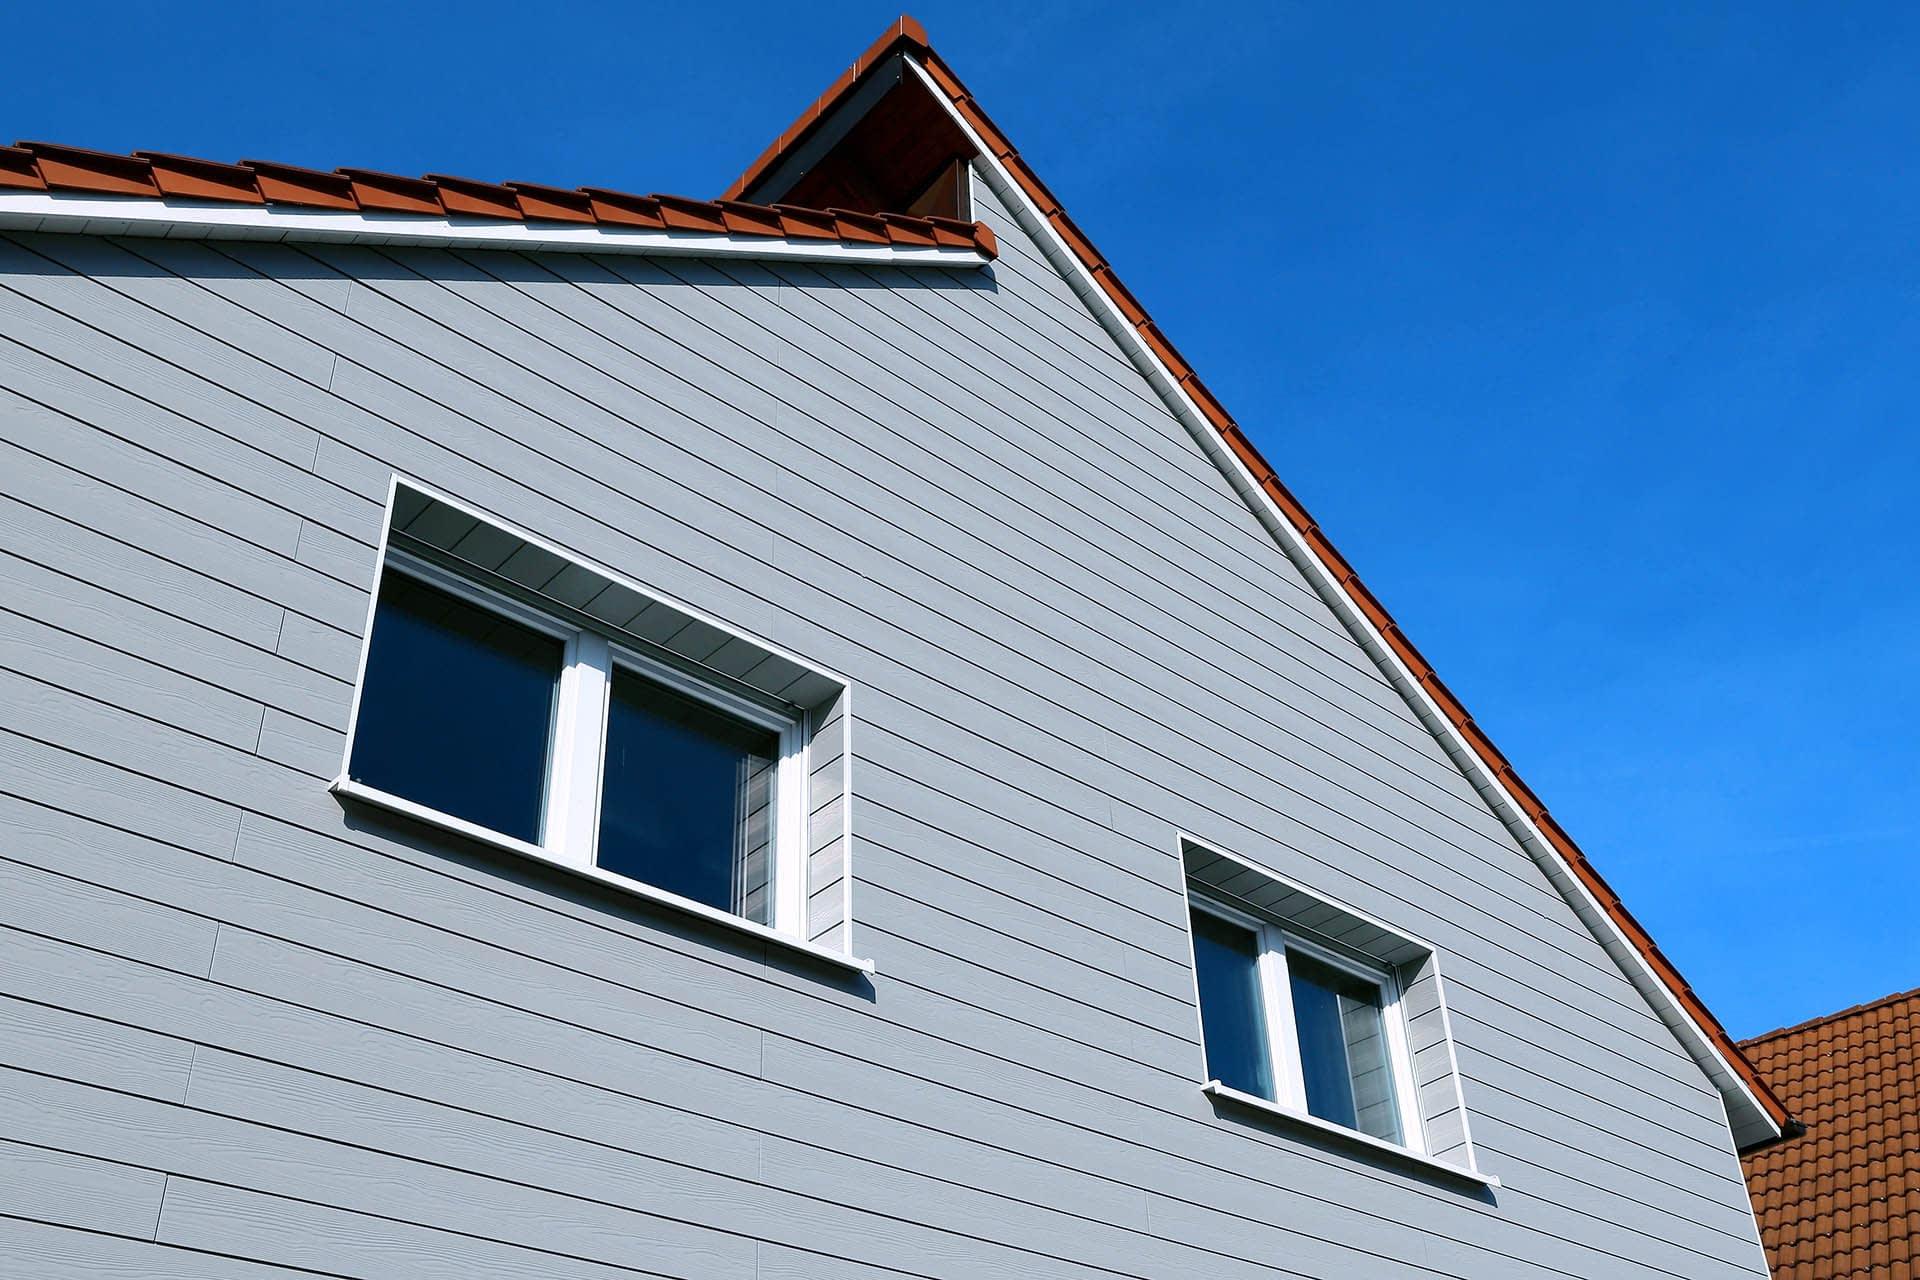 Residential home with composite cladding facade insulation - composites alternatives